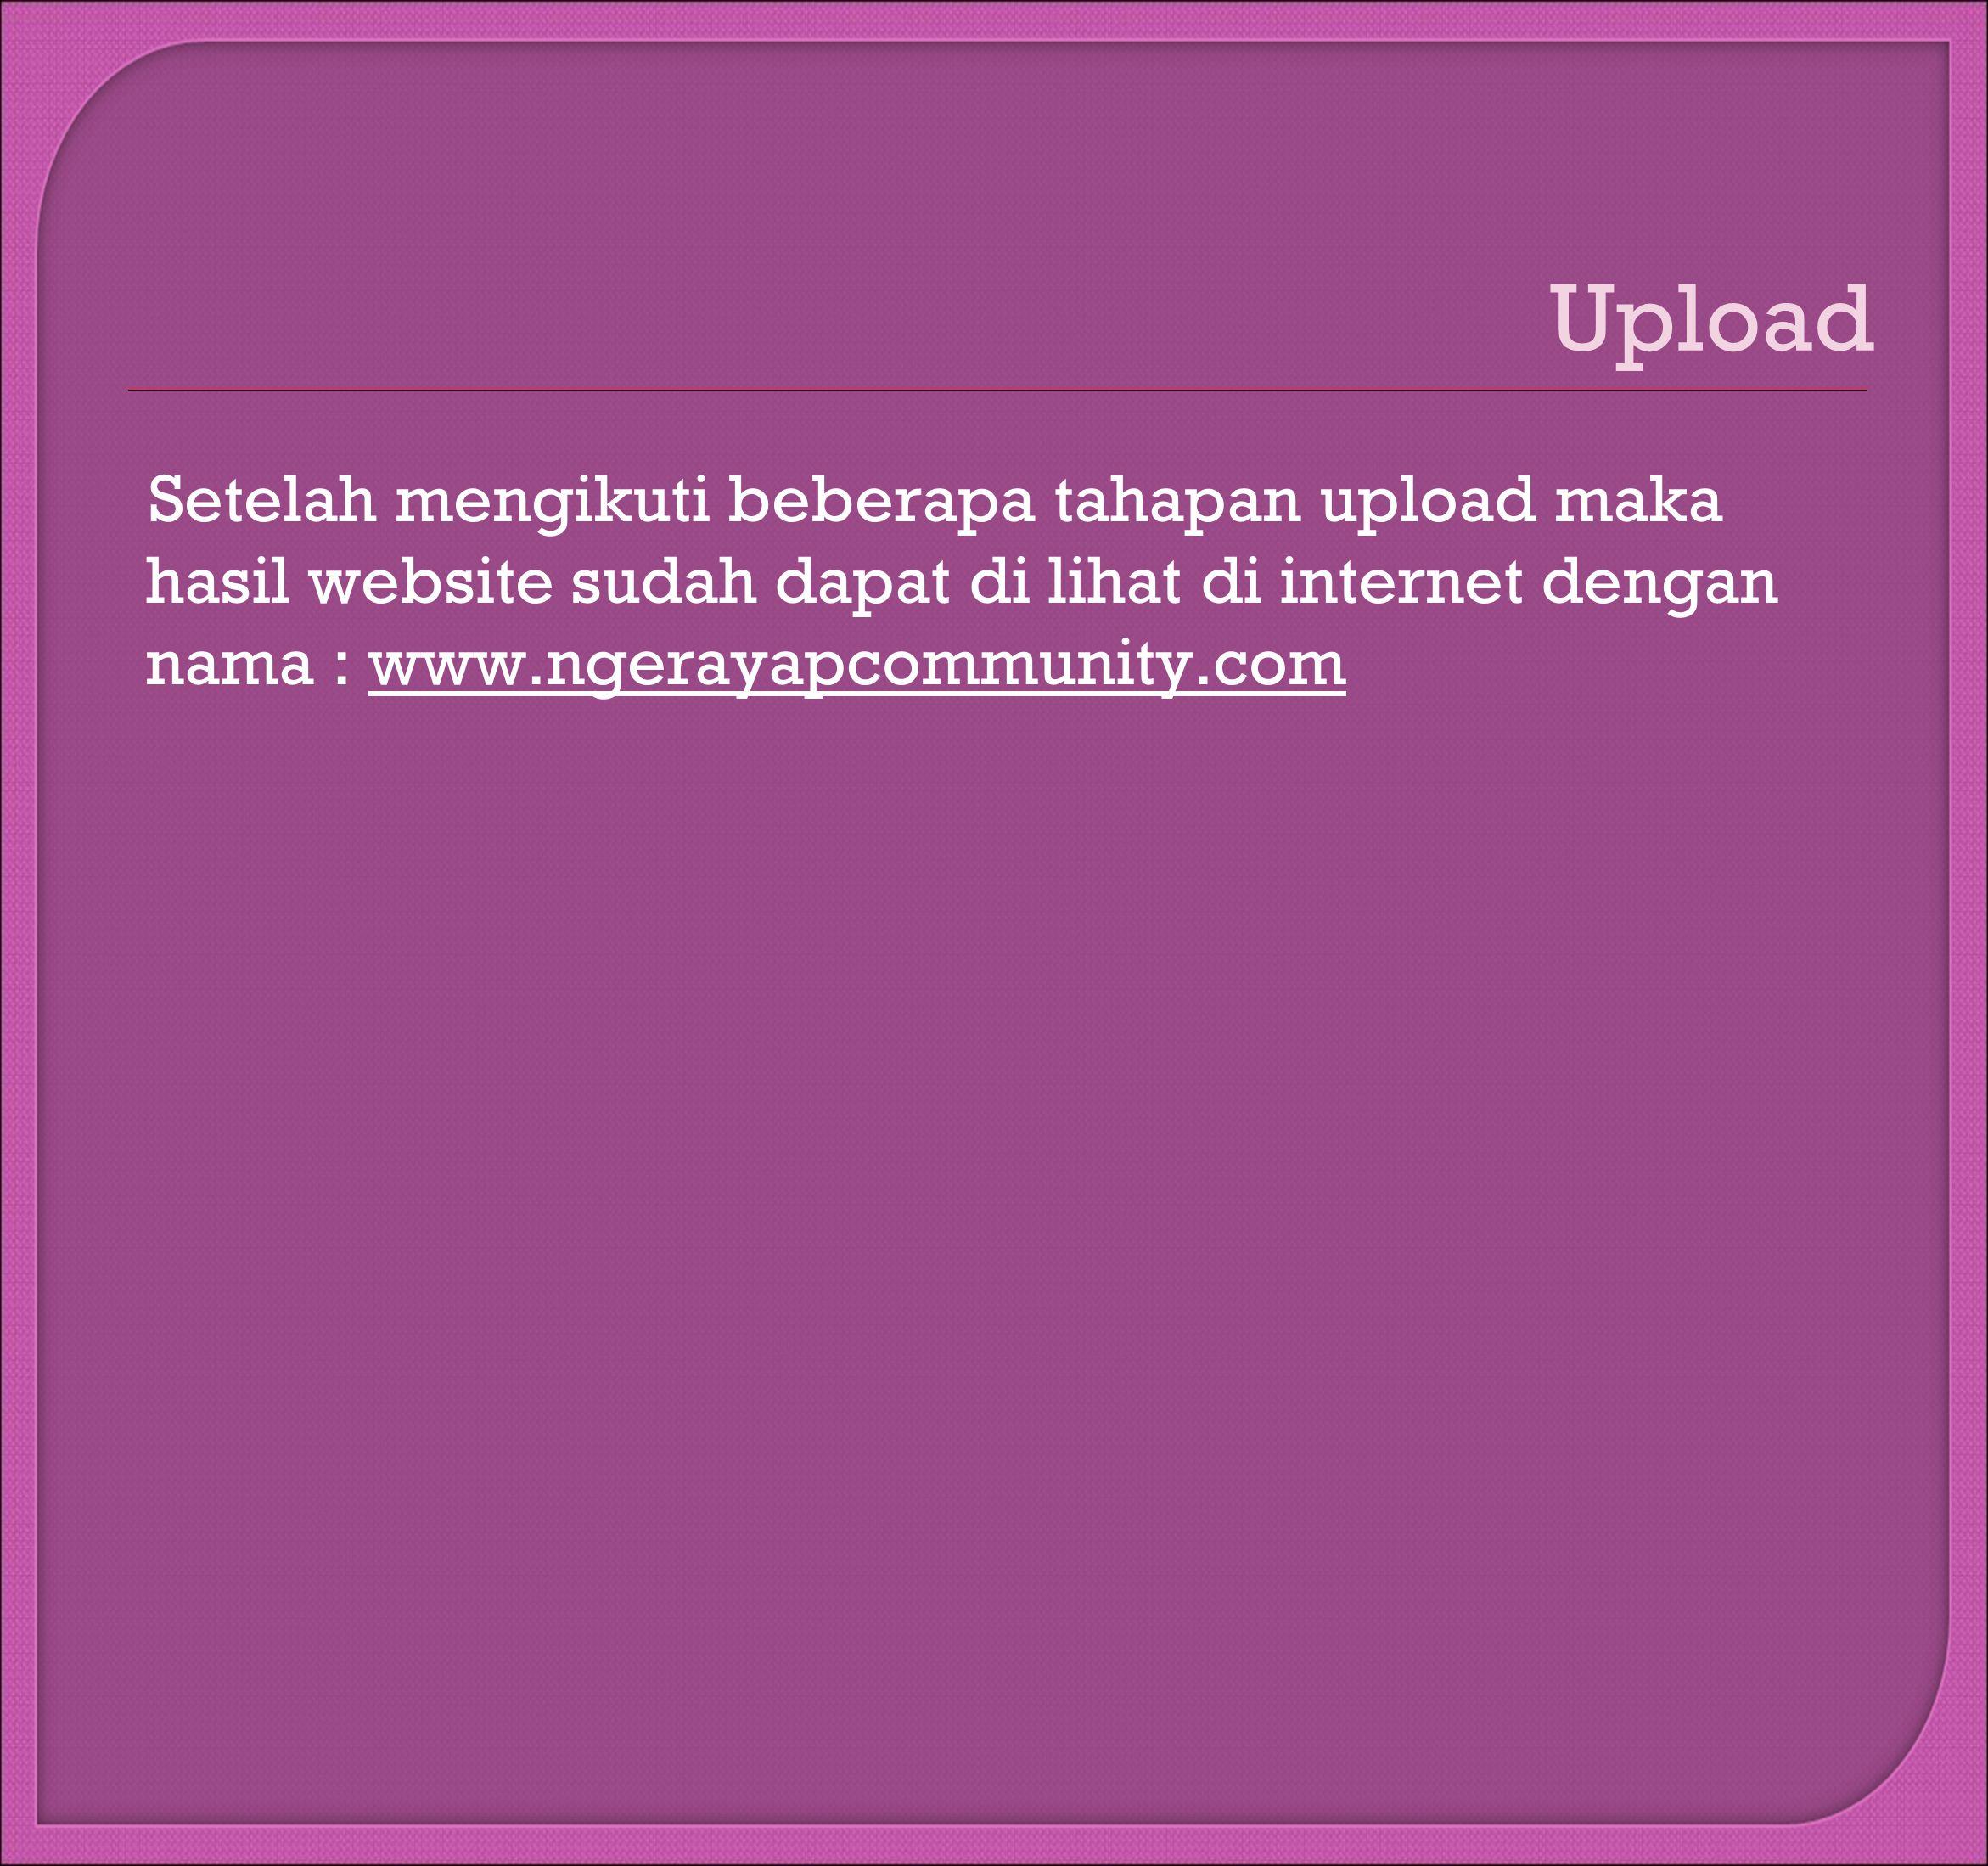 Upload Setelah mengikuti beberapa tahapan upload maka hasil website sudah dapat di lihat di internet dengan nama : www.ngerayapcommunity.com